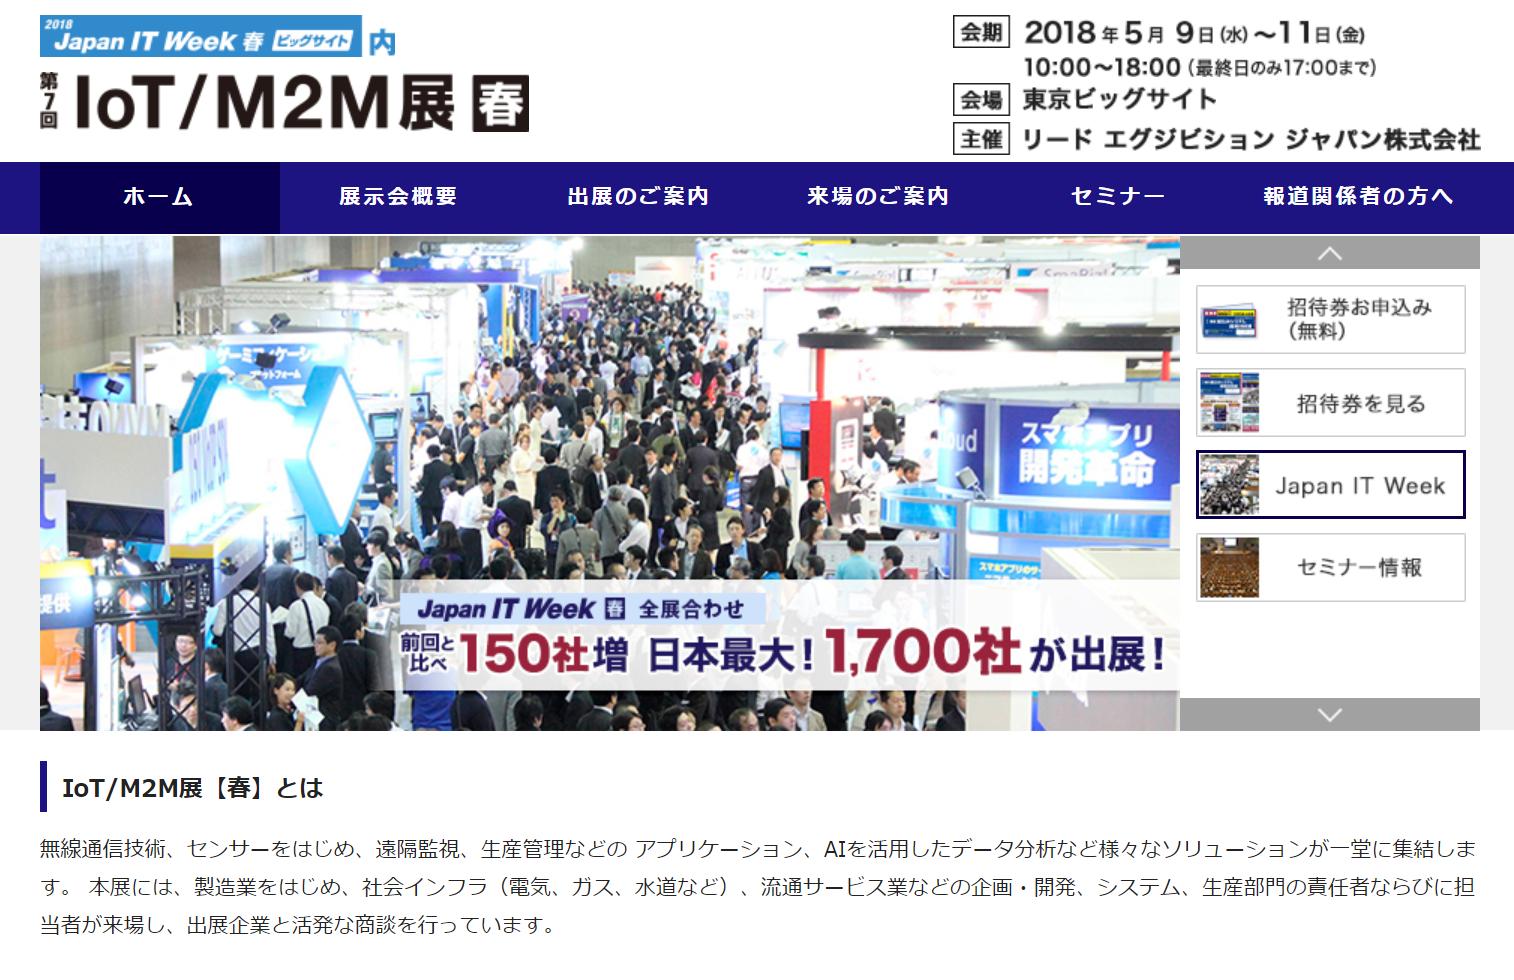 第7回IoT/M2M展春